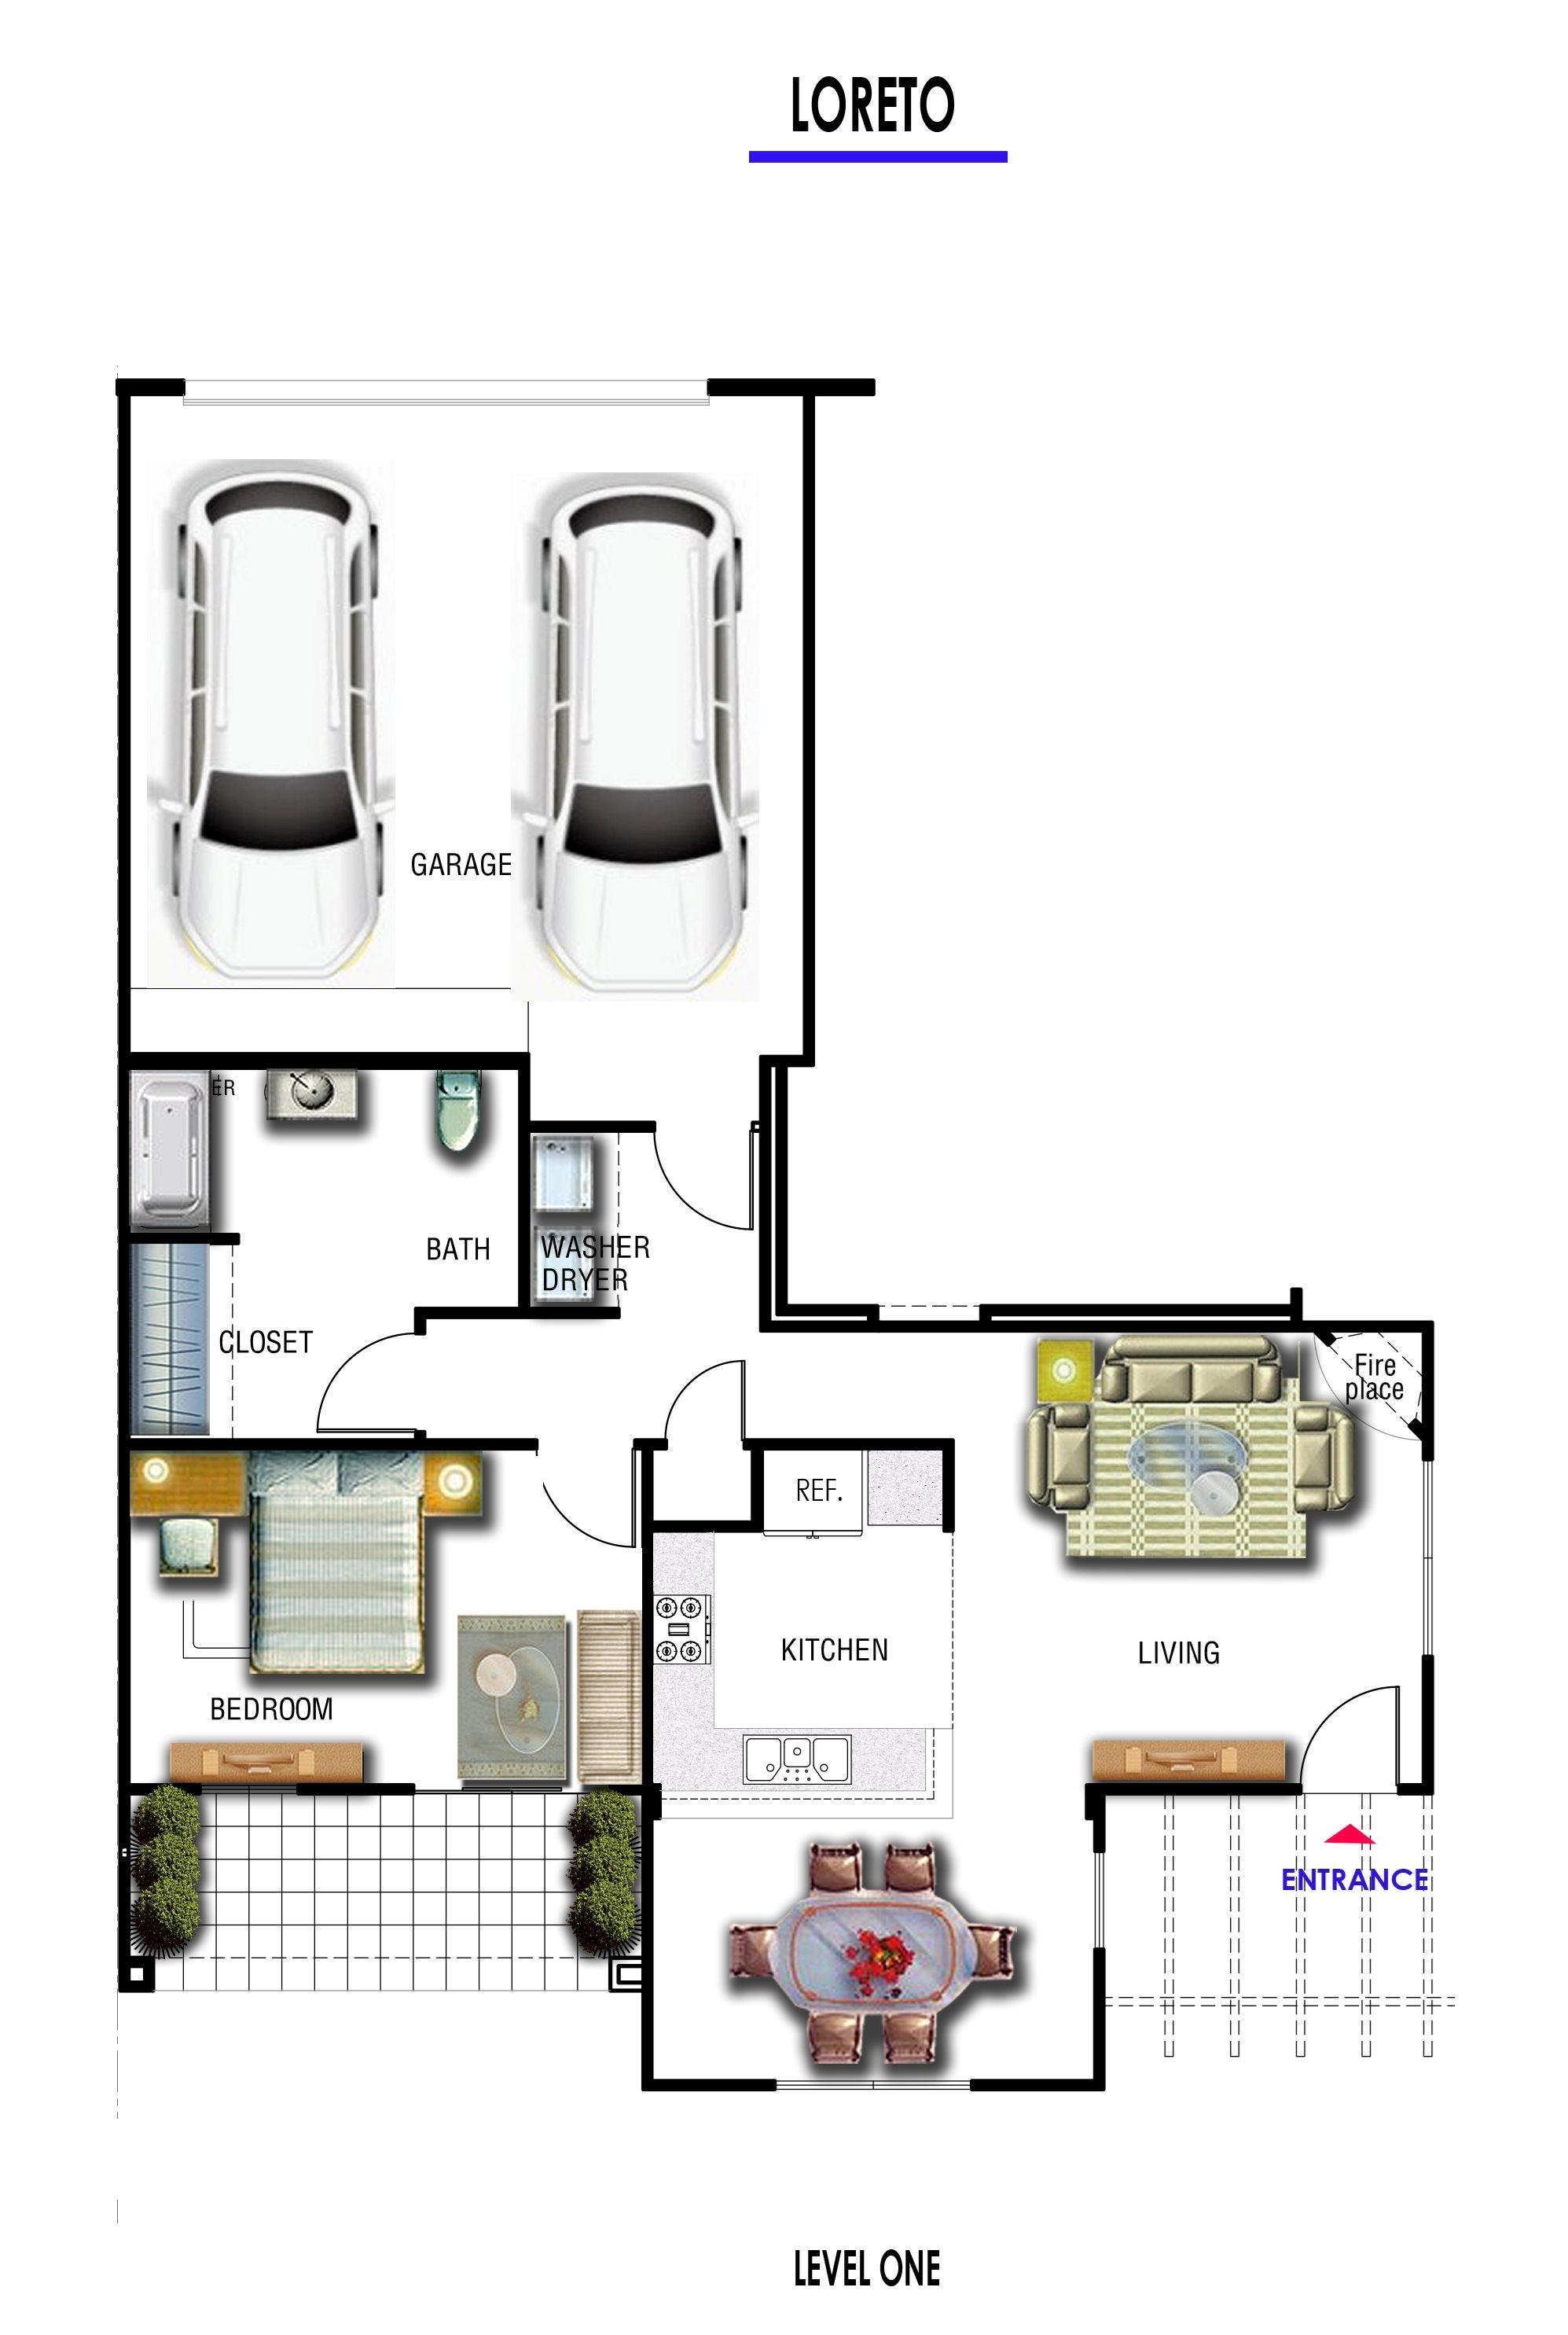 WIllow-apartments-1bedroom-1bath-floorplan